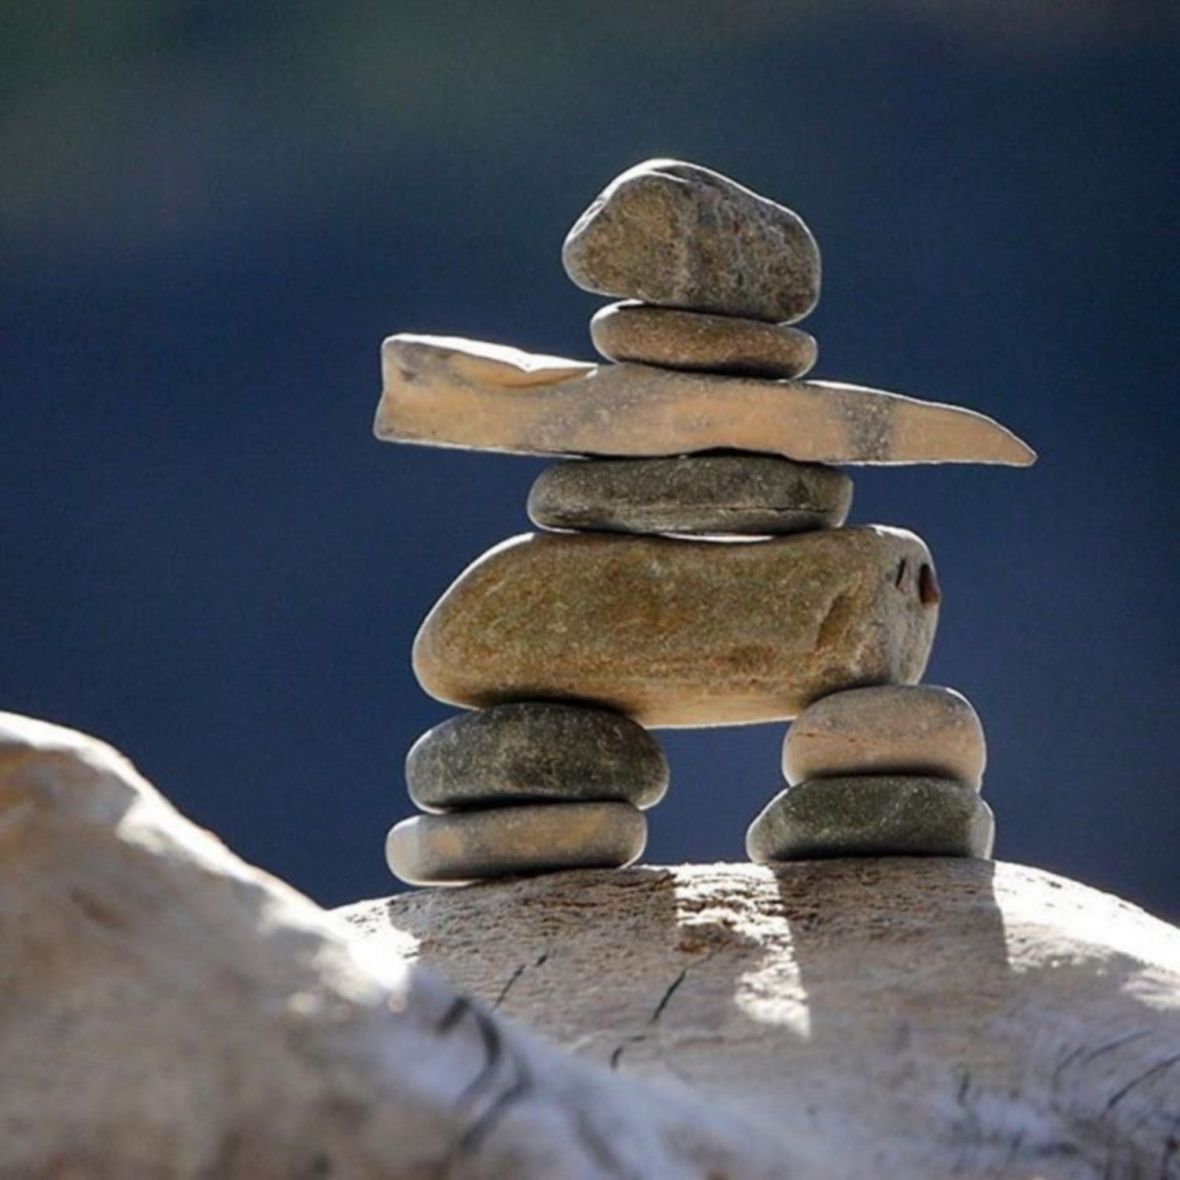 inukshuk art mégalitique stone balance